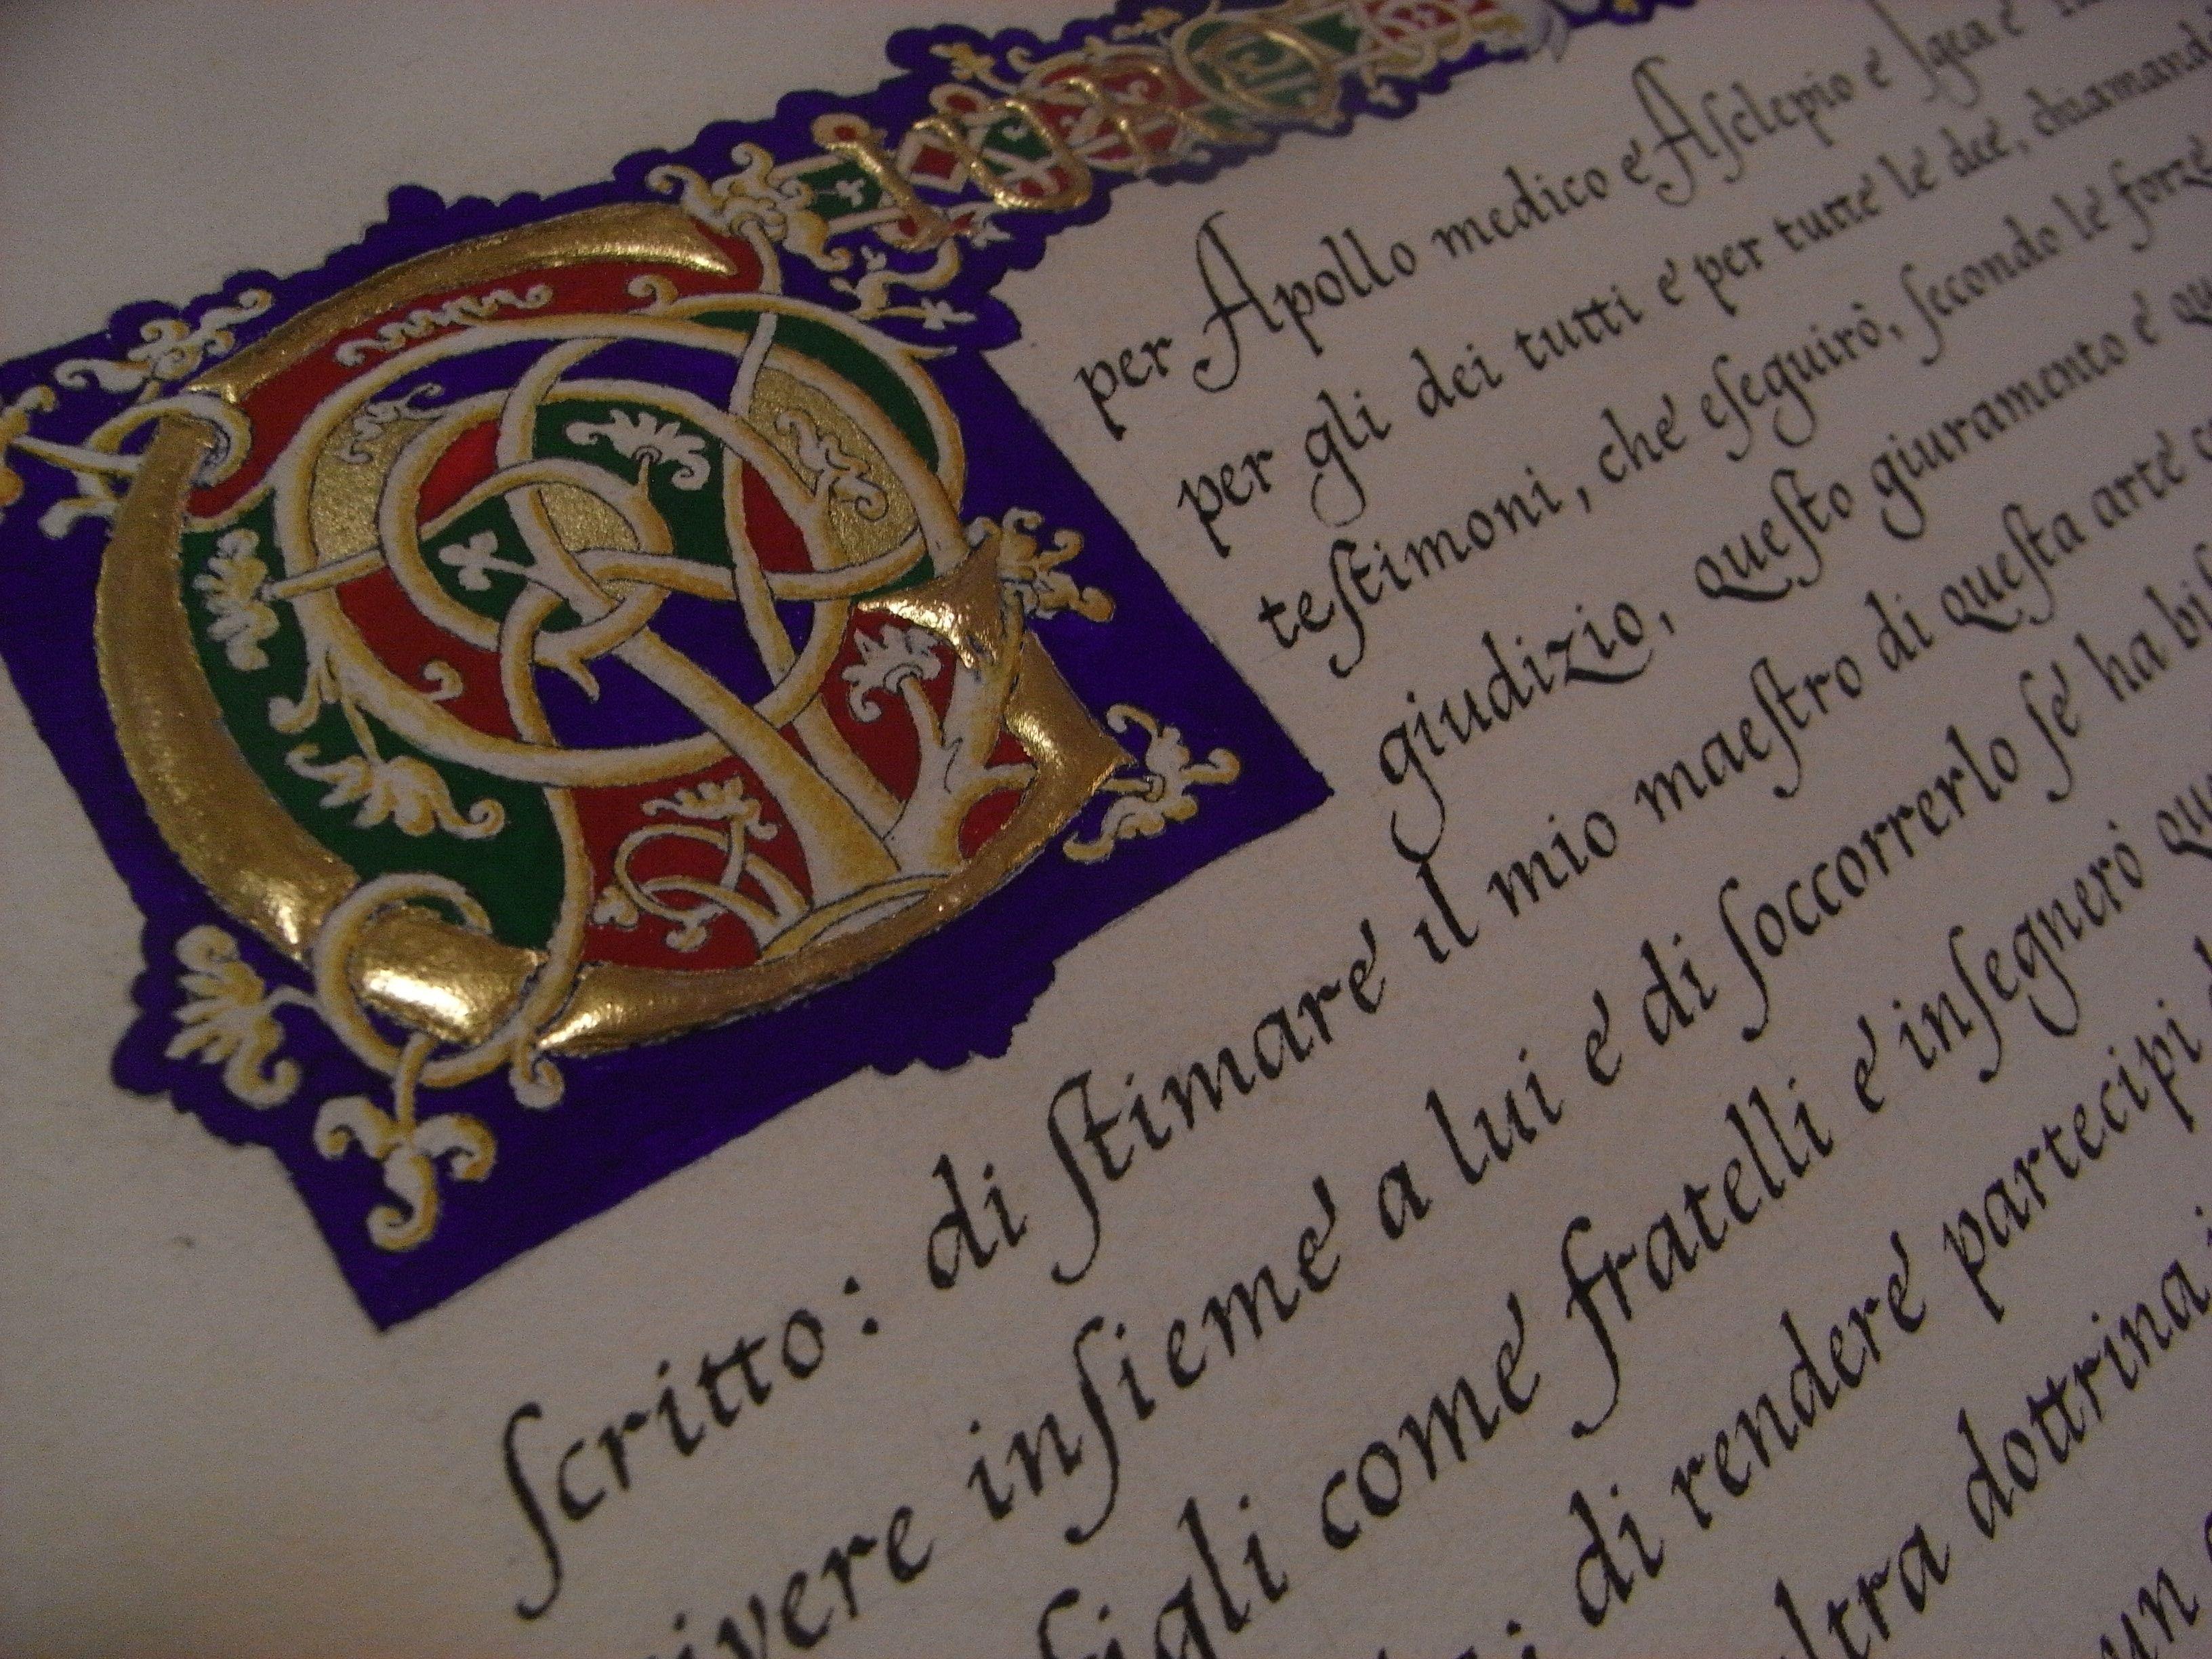 Cancelleresca con Capolettera a Bianchi Girari - Italian Chancery script with illuminated initial in Bianchi Girari style